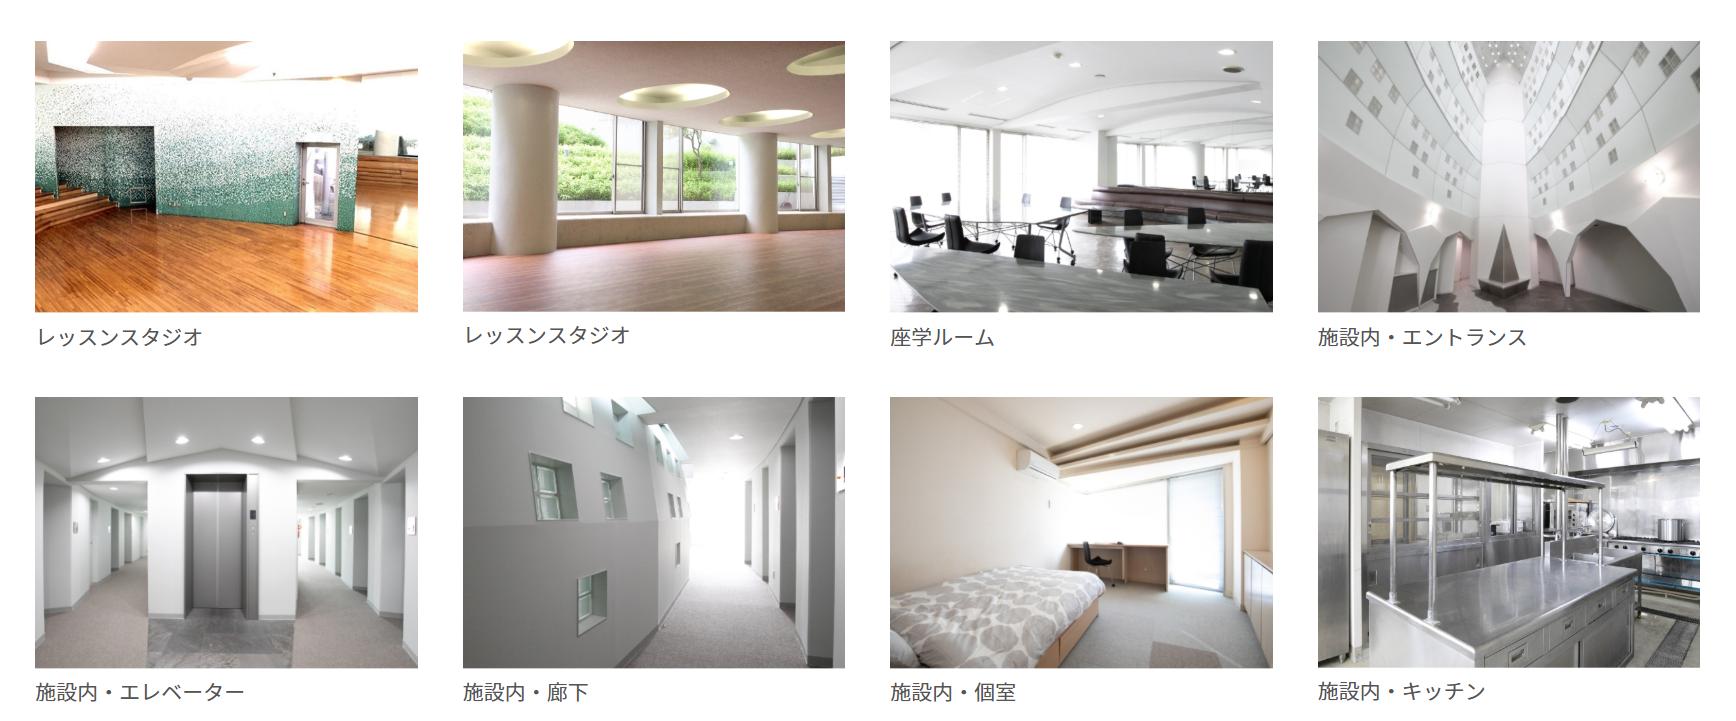 宿泊施設の内装